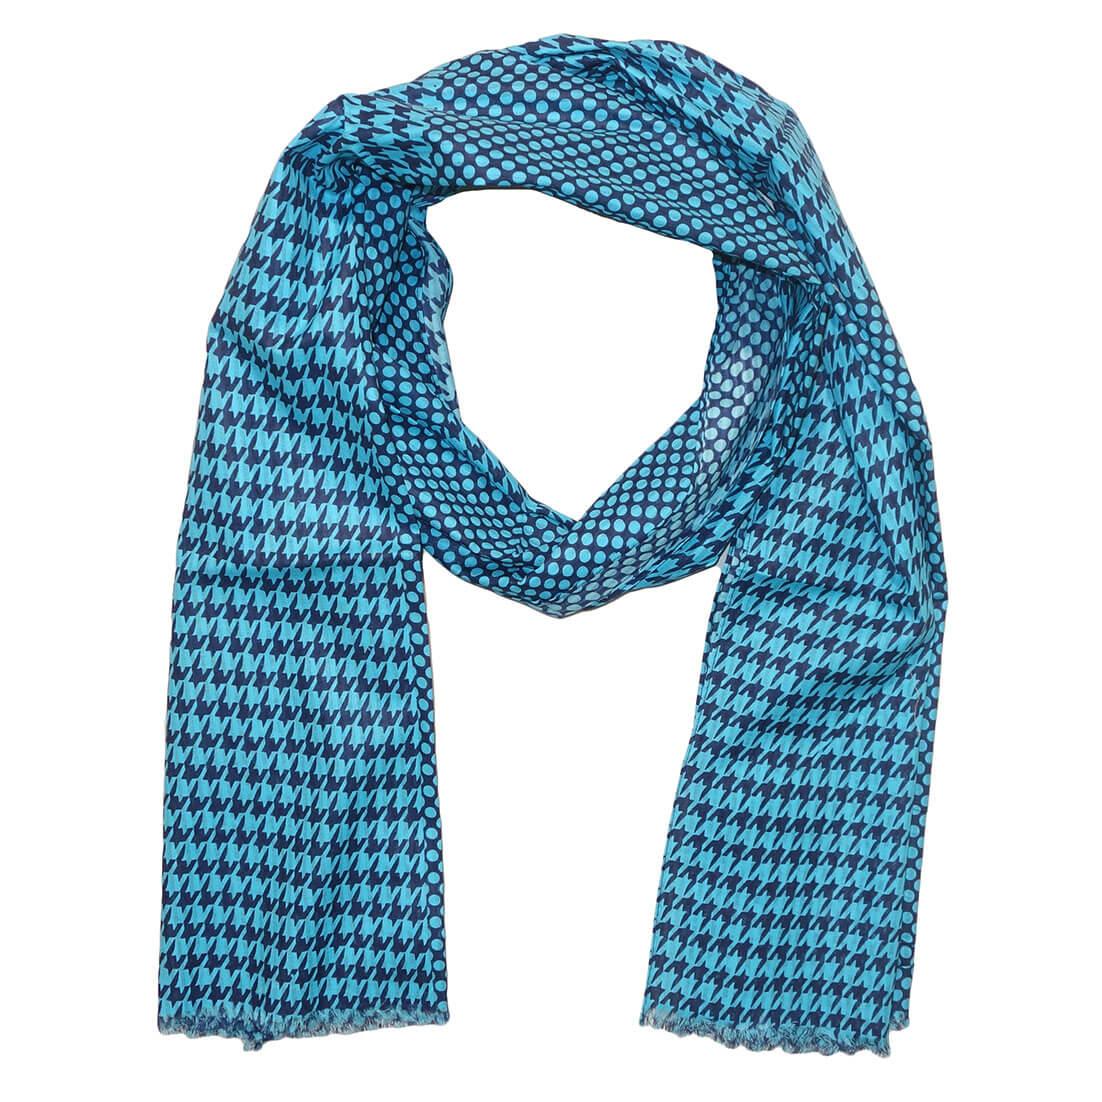 Langwerpige Katoenen Sjaal Polkadot / Pied de Poule Turquoise-0